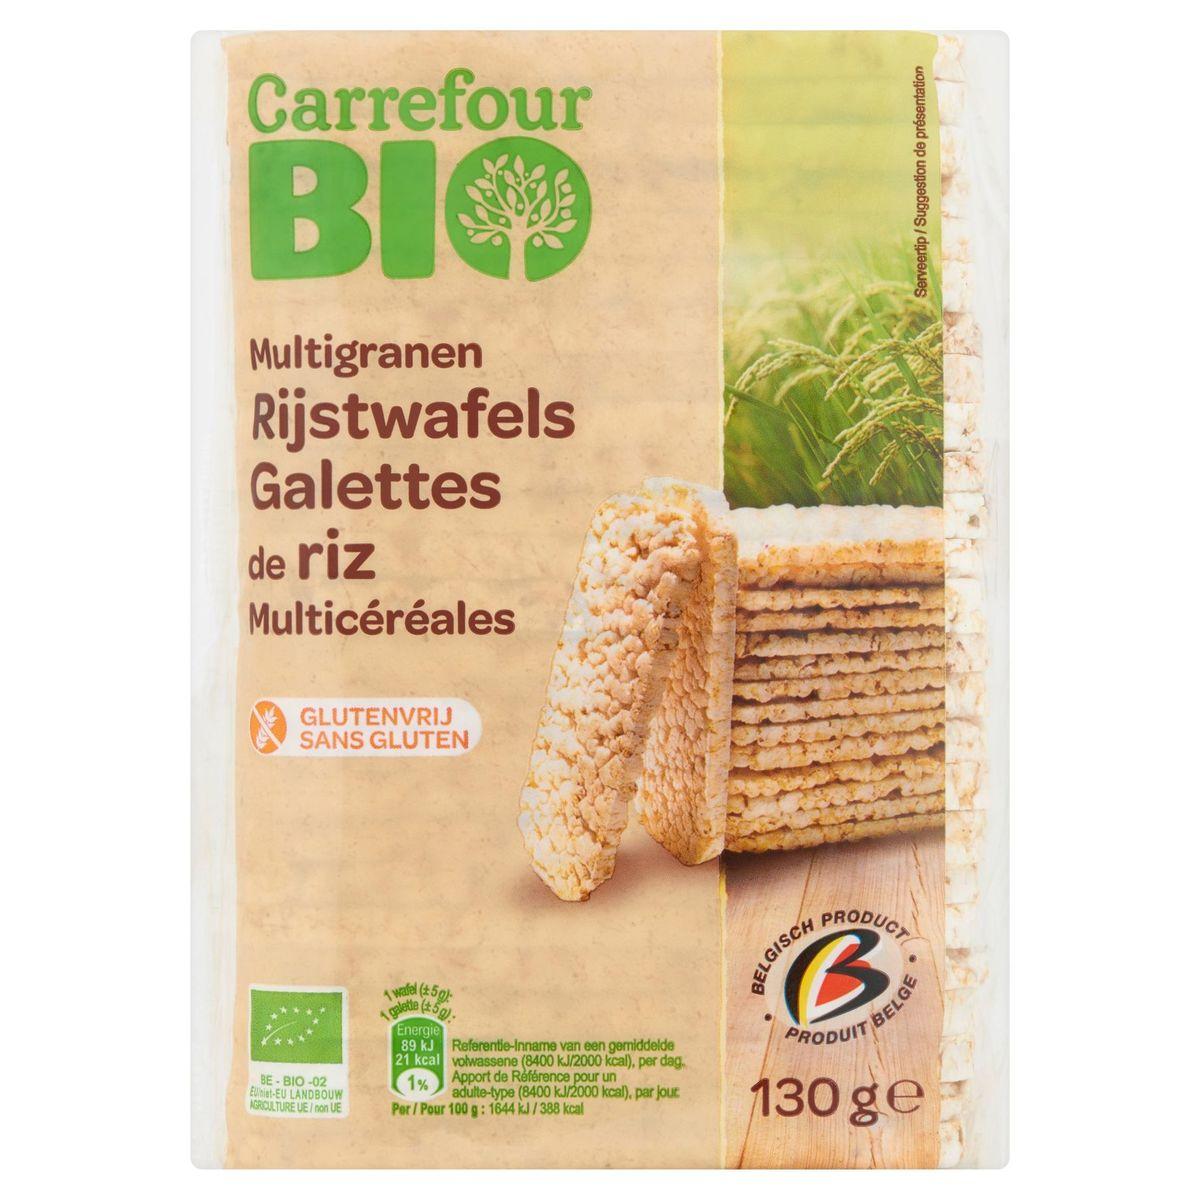 Carrefour Bio Multigranen Rijstwafels 130 g